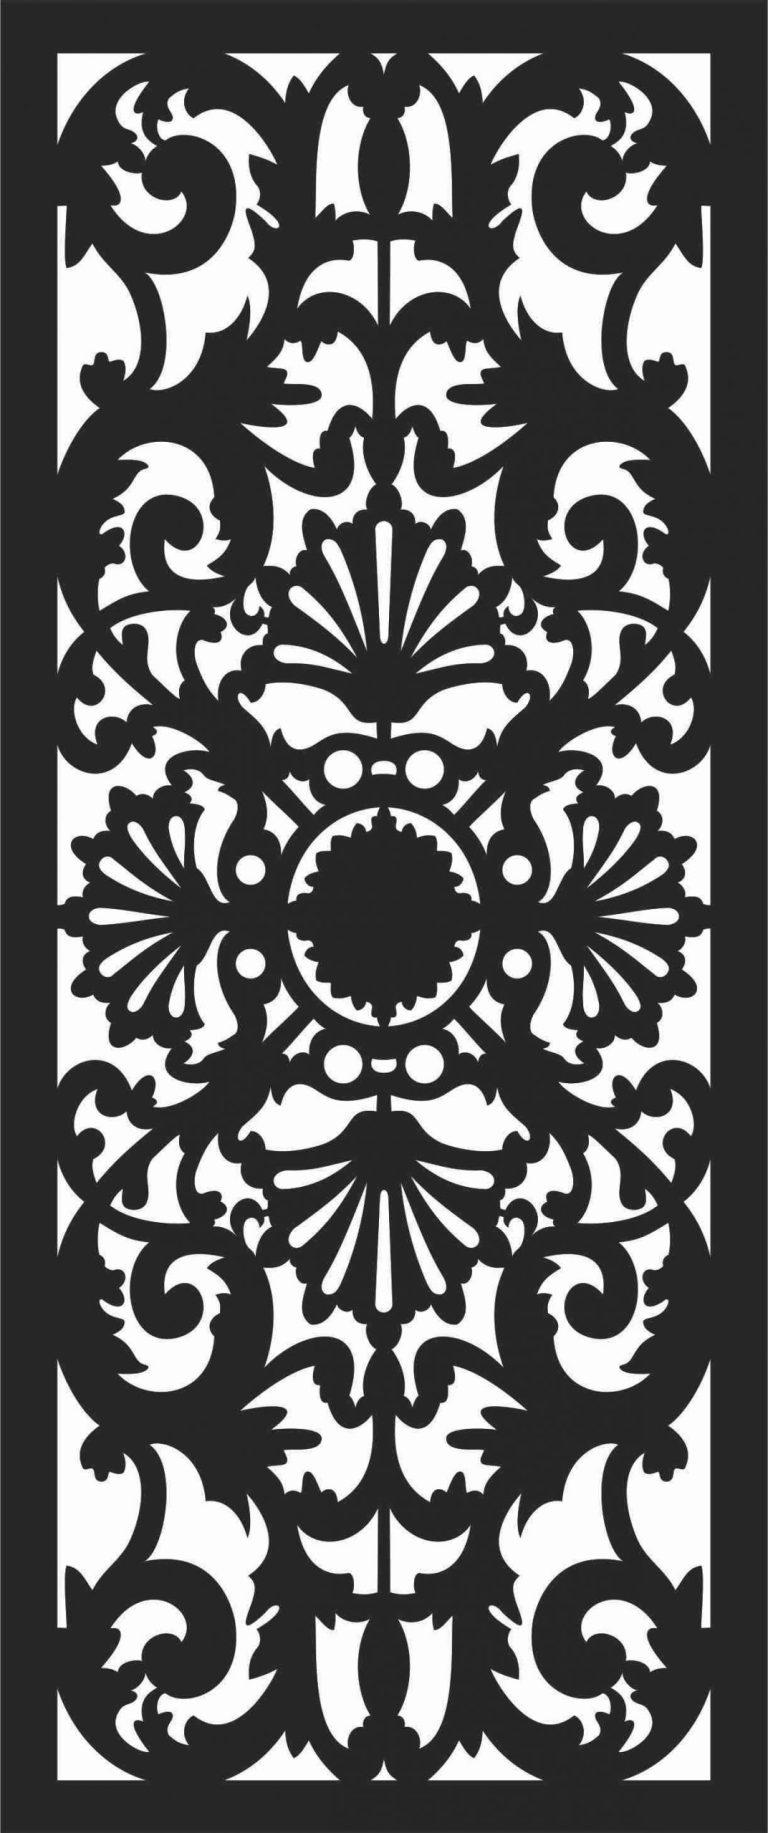 Screen Panel Patterns Seamless 41 Free DXF File